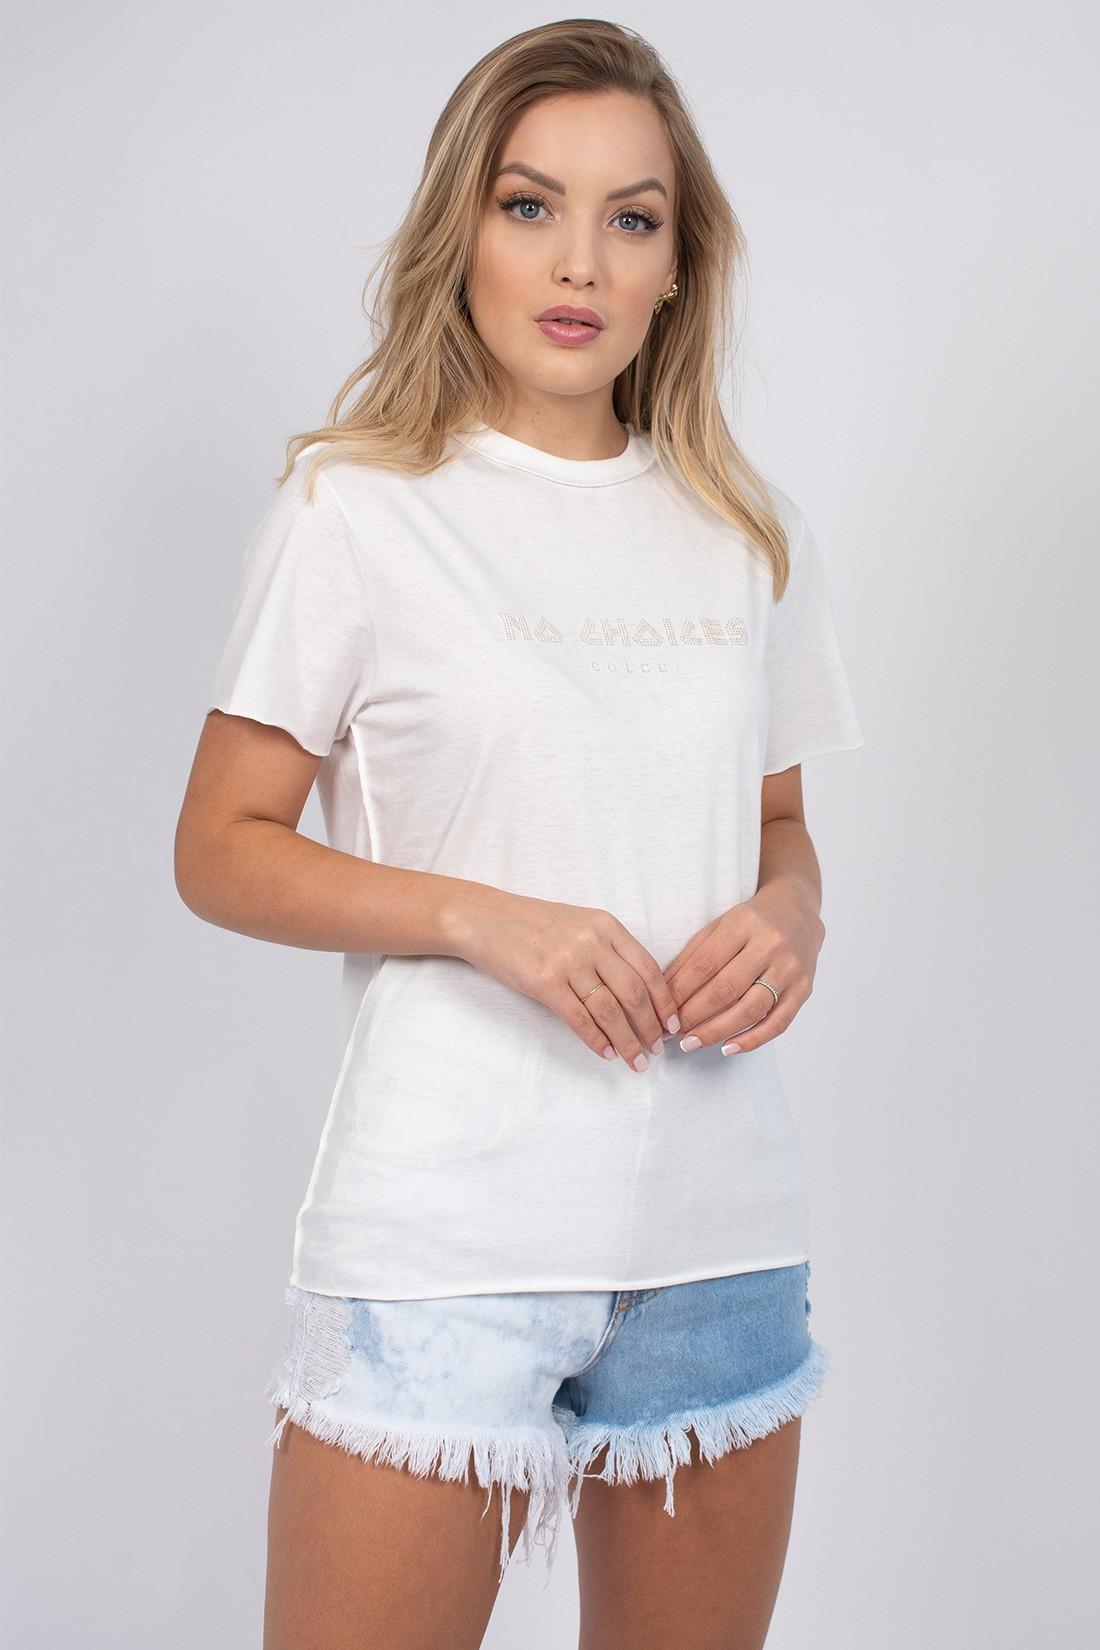 T Shirt Colcci No Choices